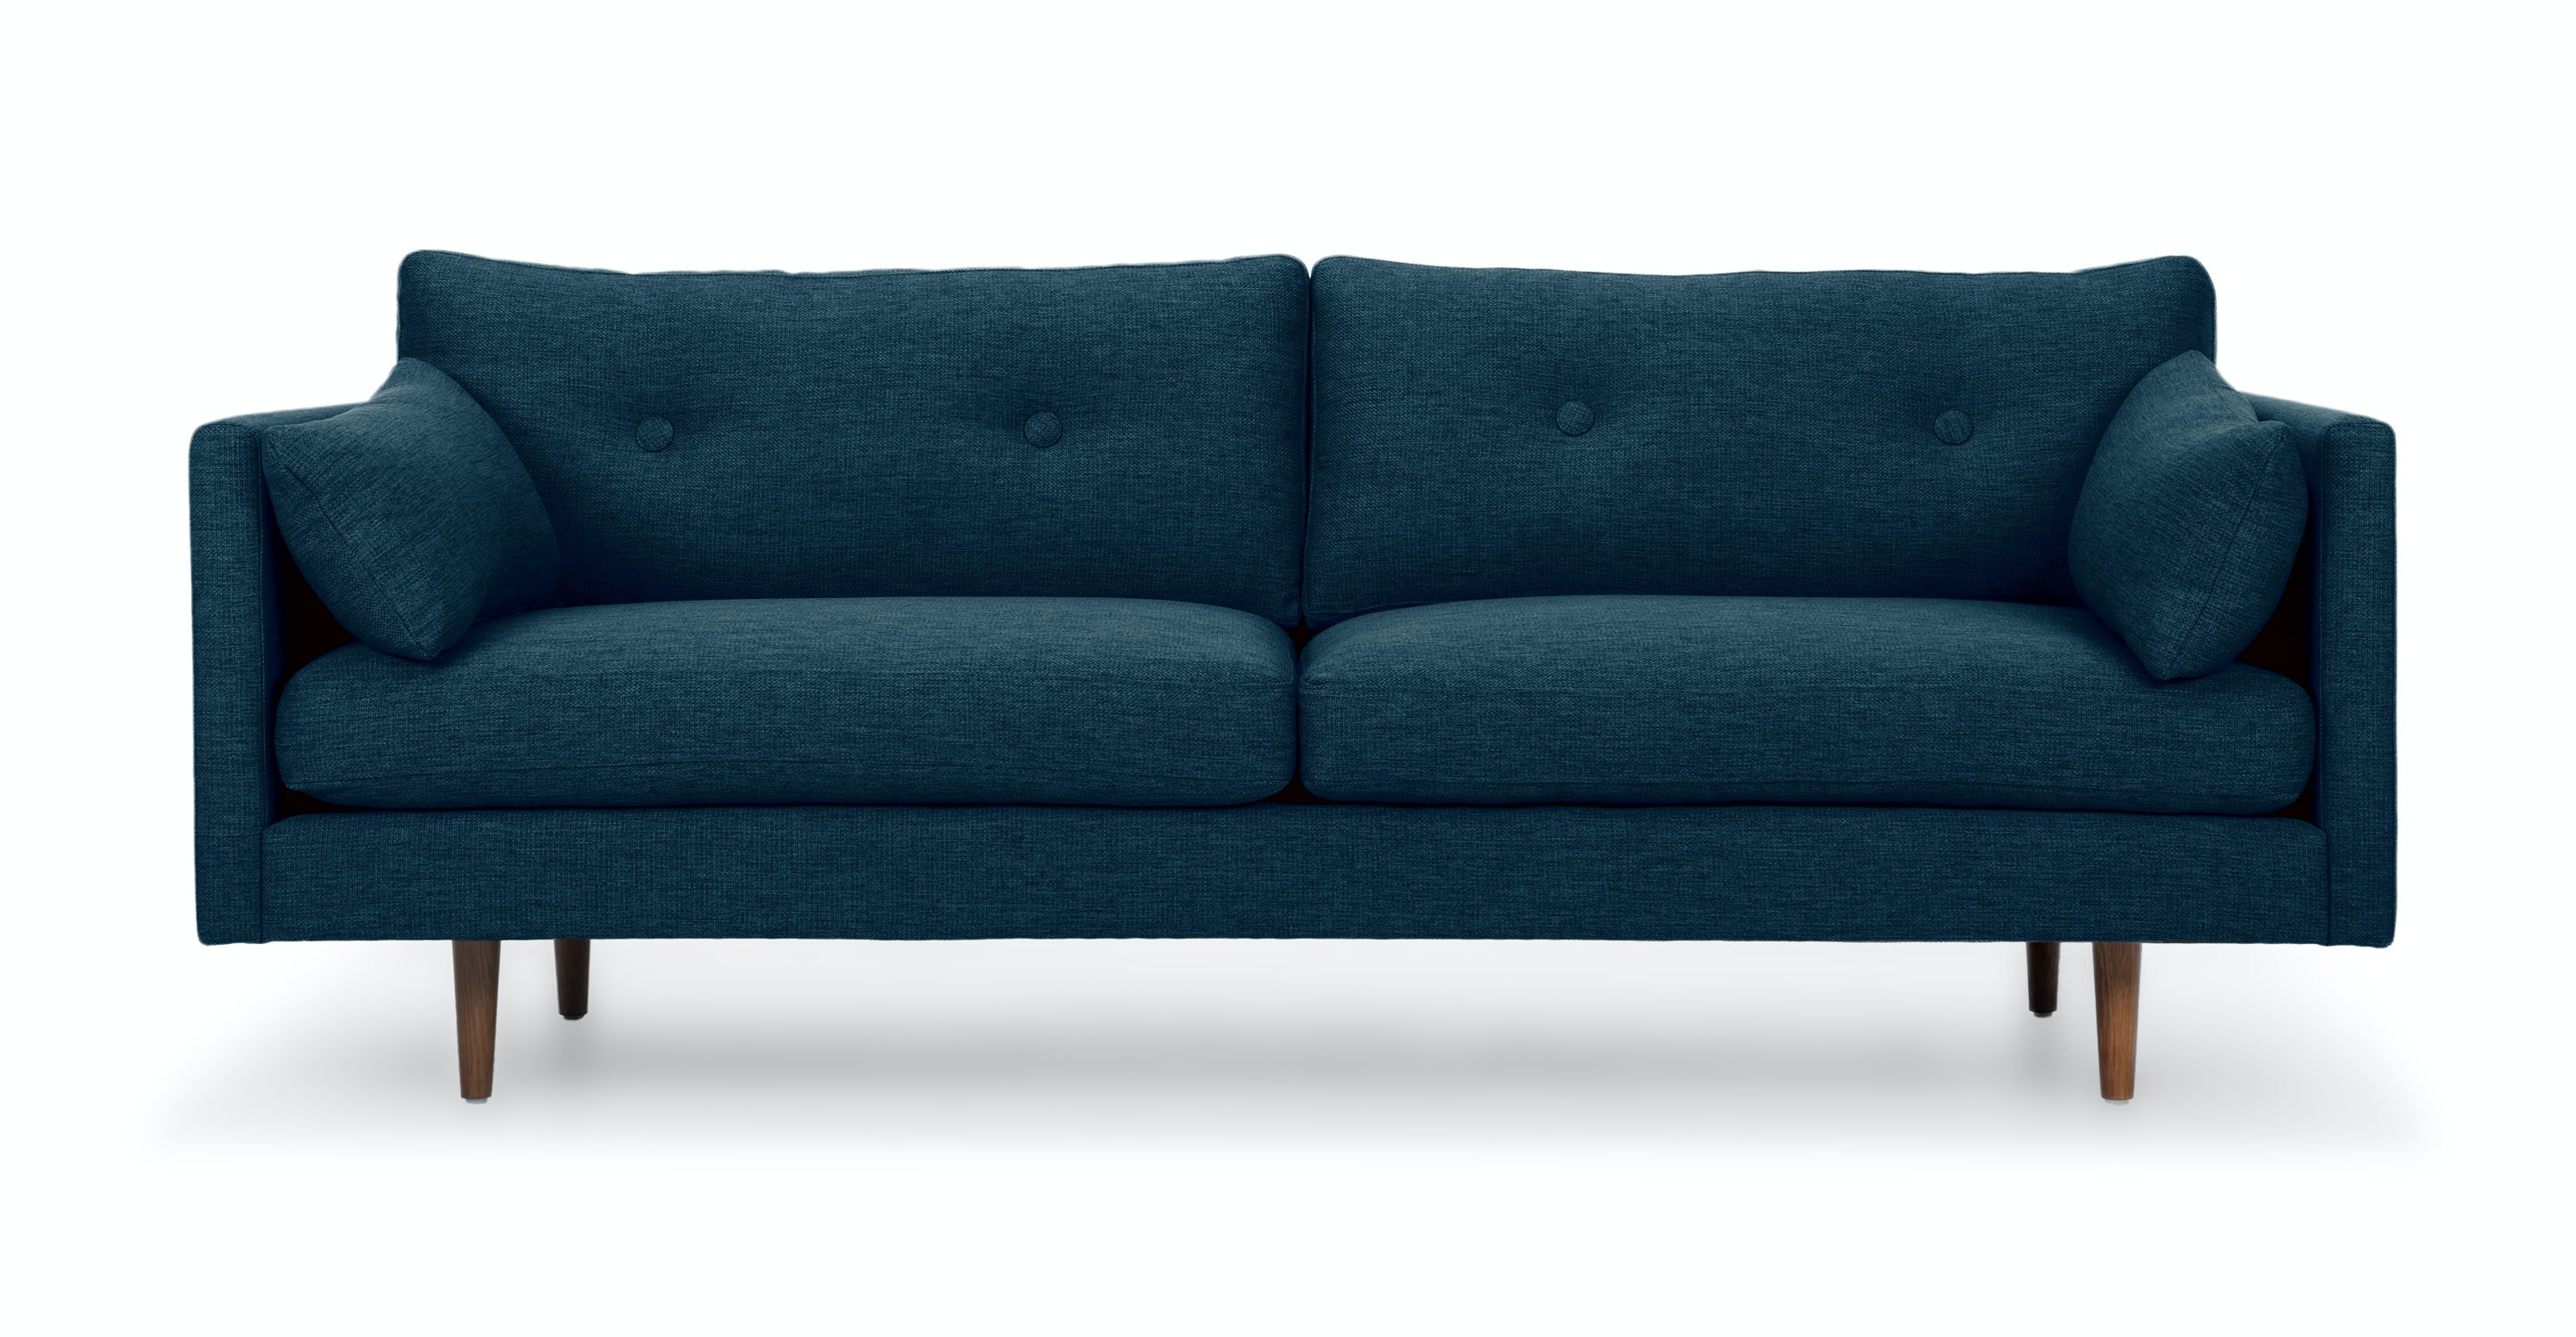 Wonderful Anton Arizona Turquoise Sofa   Sofas   Article | Modern, Mid Century And  Scandinavian Furniture